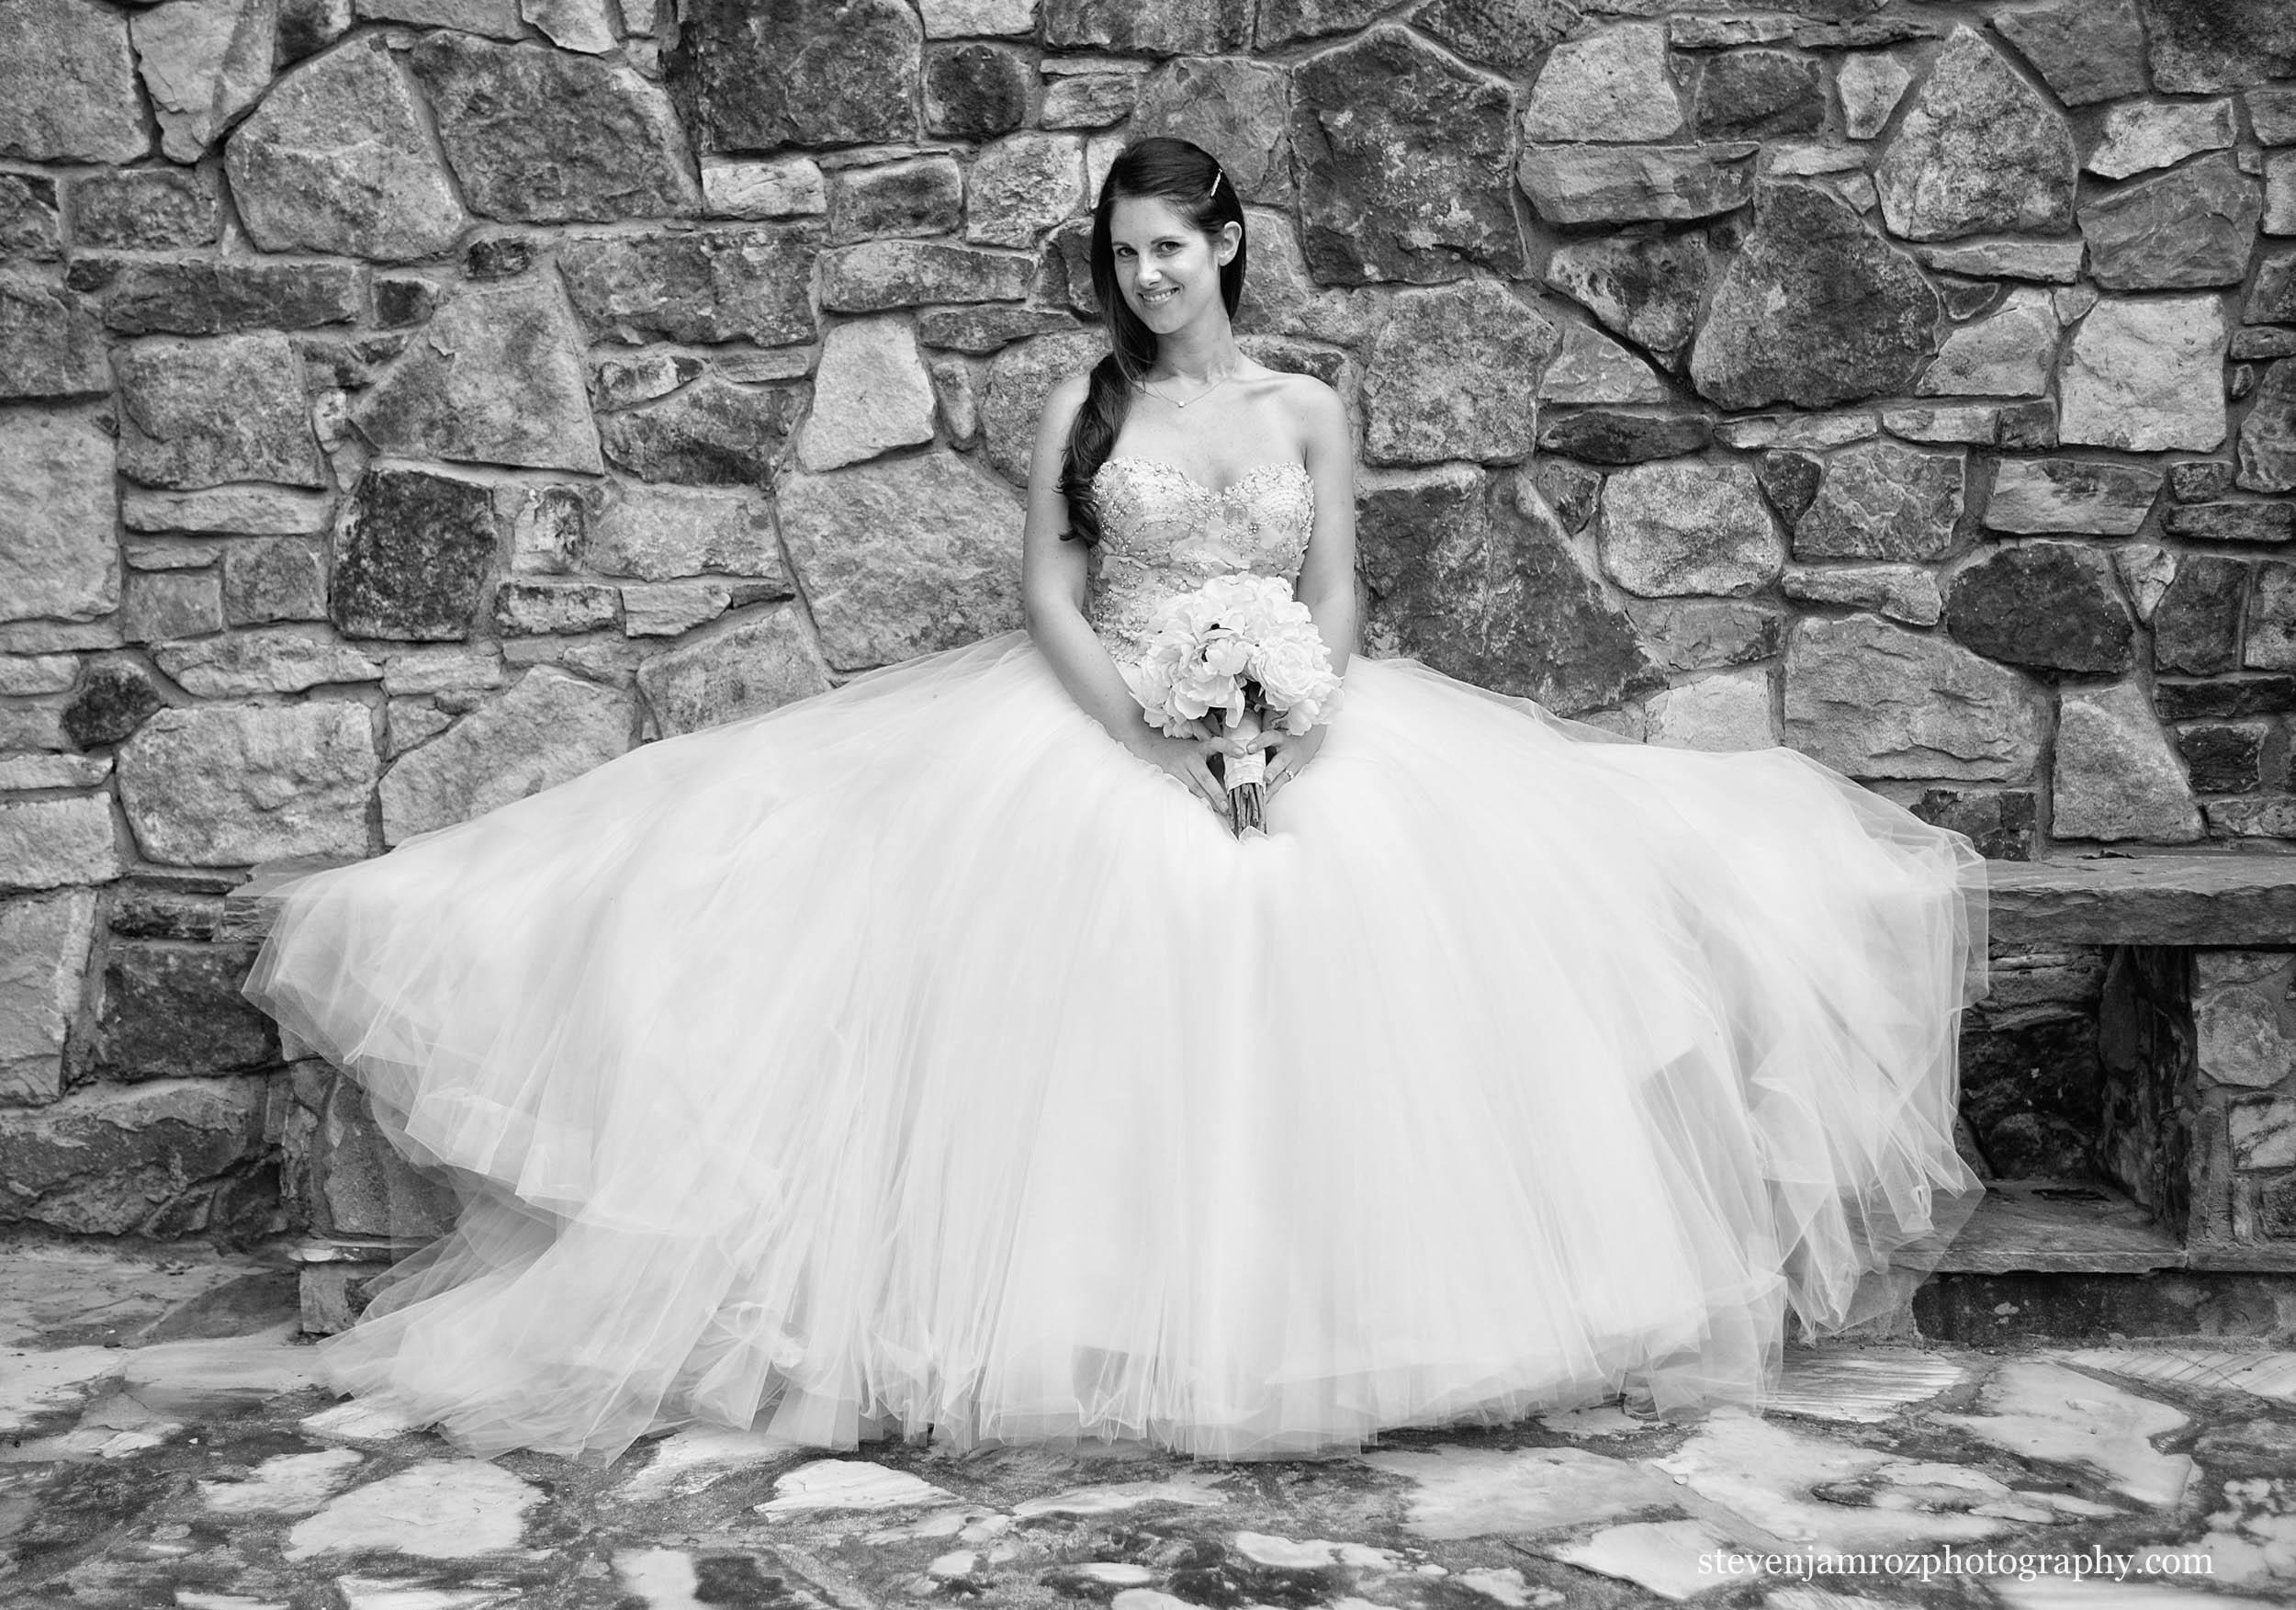 pretty-bridal-portrait-chapel-hill-steven-jamroz-photography-0310.jpg